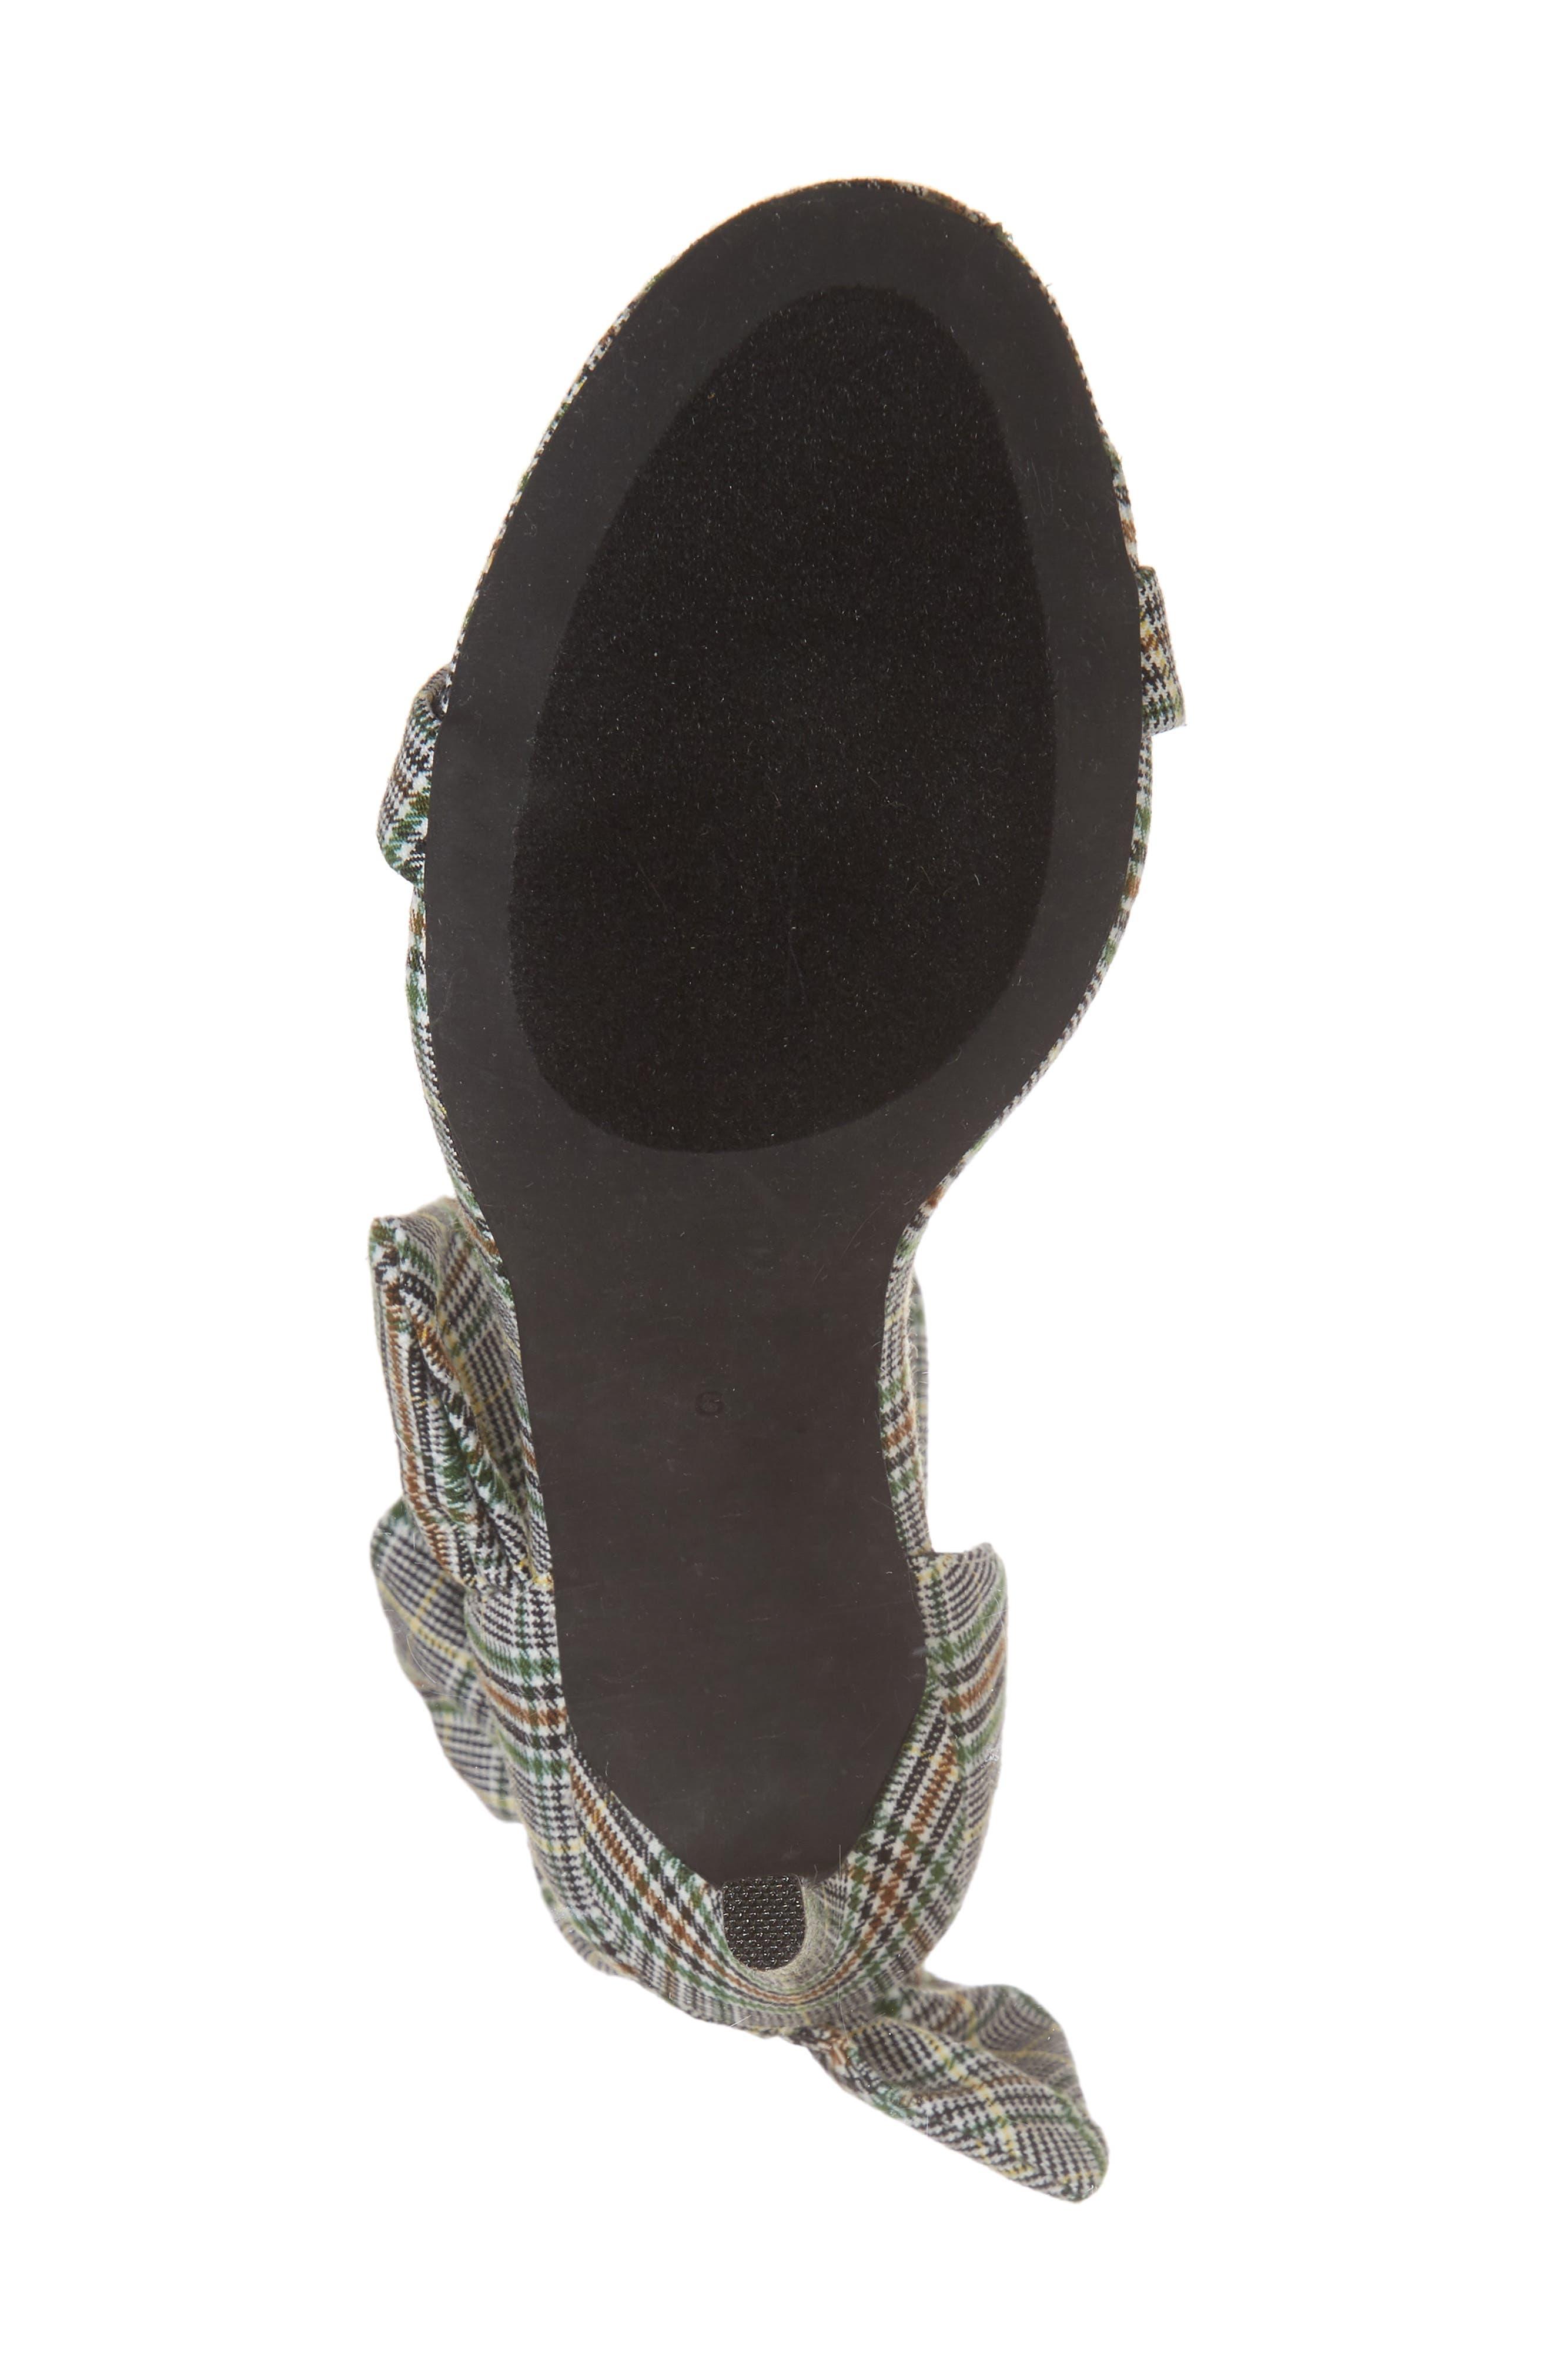 Cheshire Ruffle Sandal,                             Alternate thumbnail 5, color,                             Black/ White/ Green Fabric